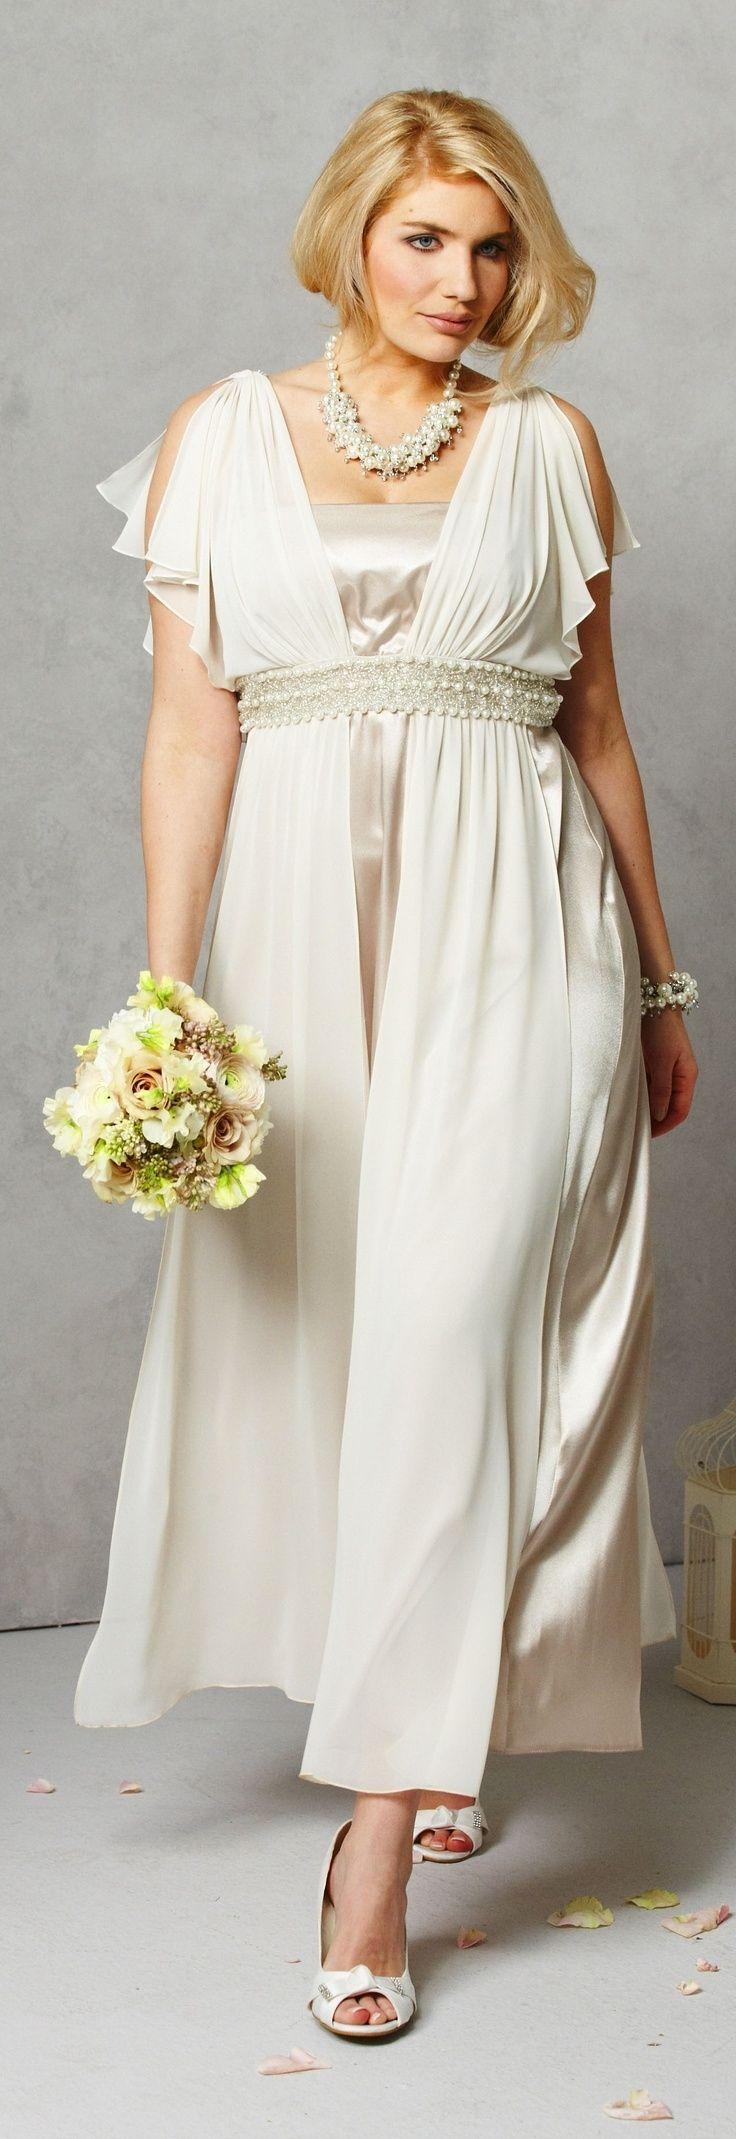 Wedding Dresses For Old Fat Brides